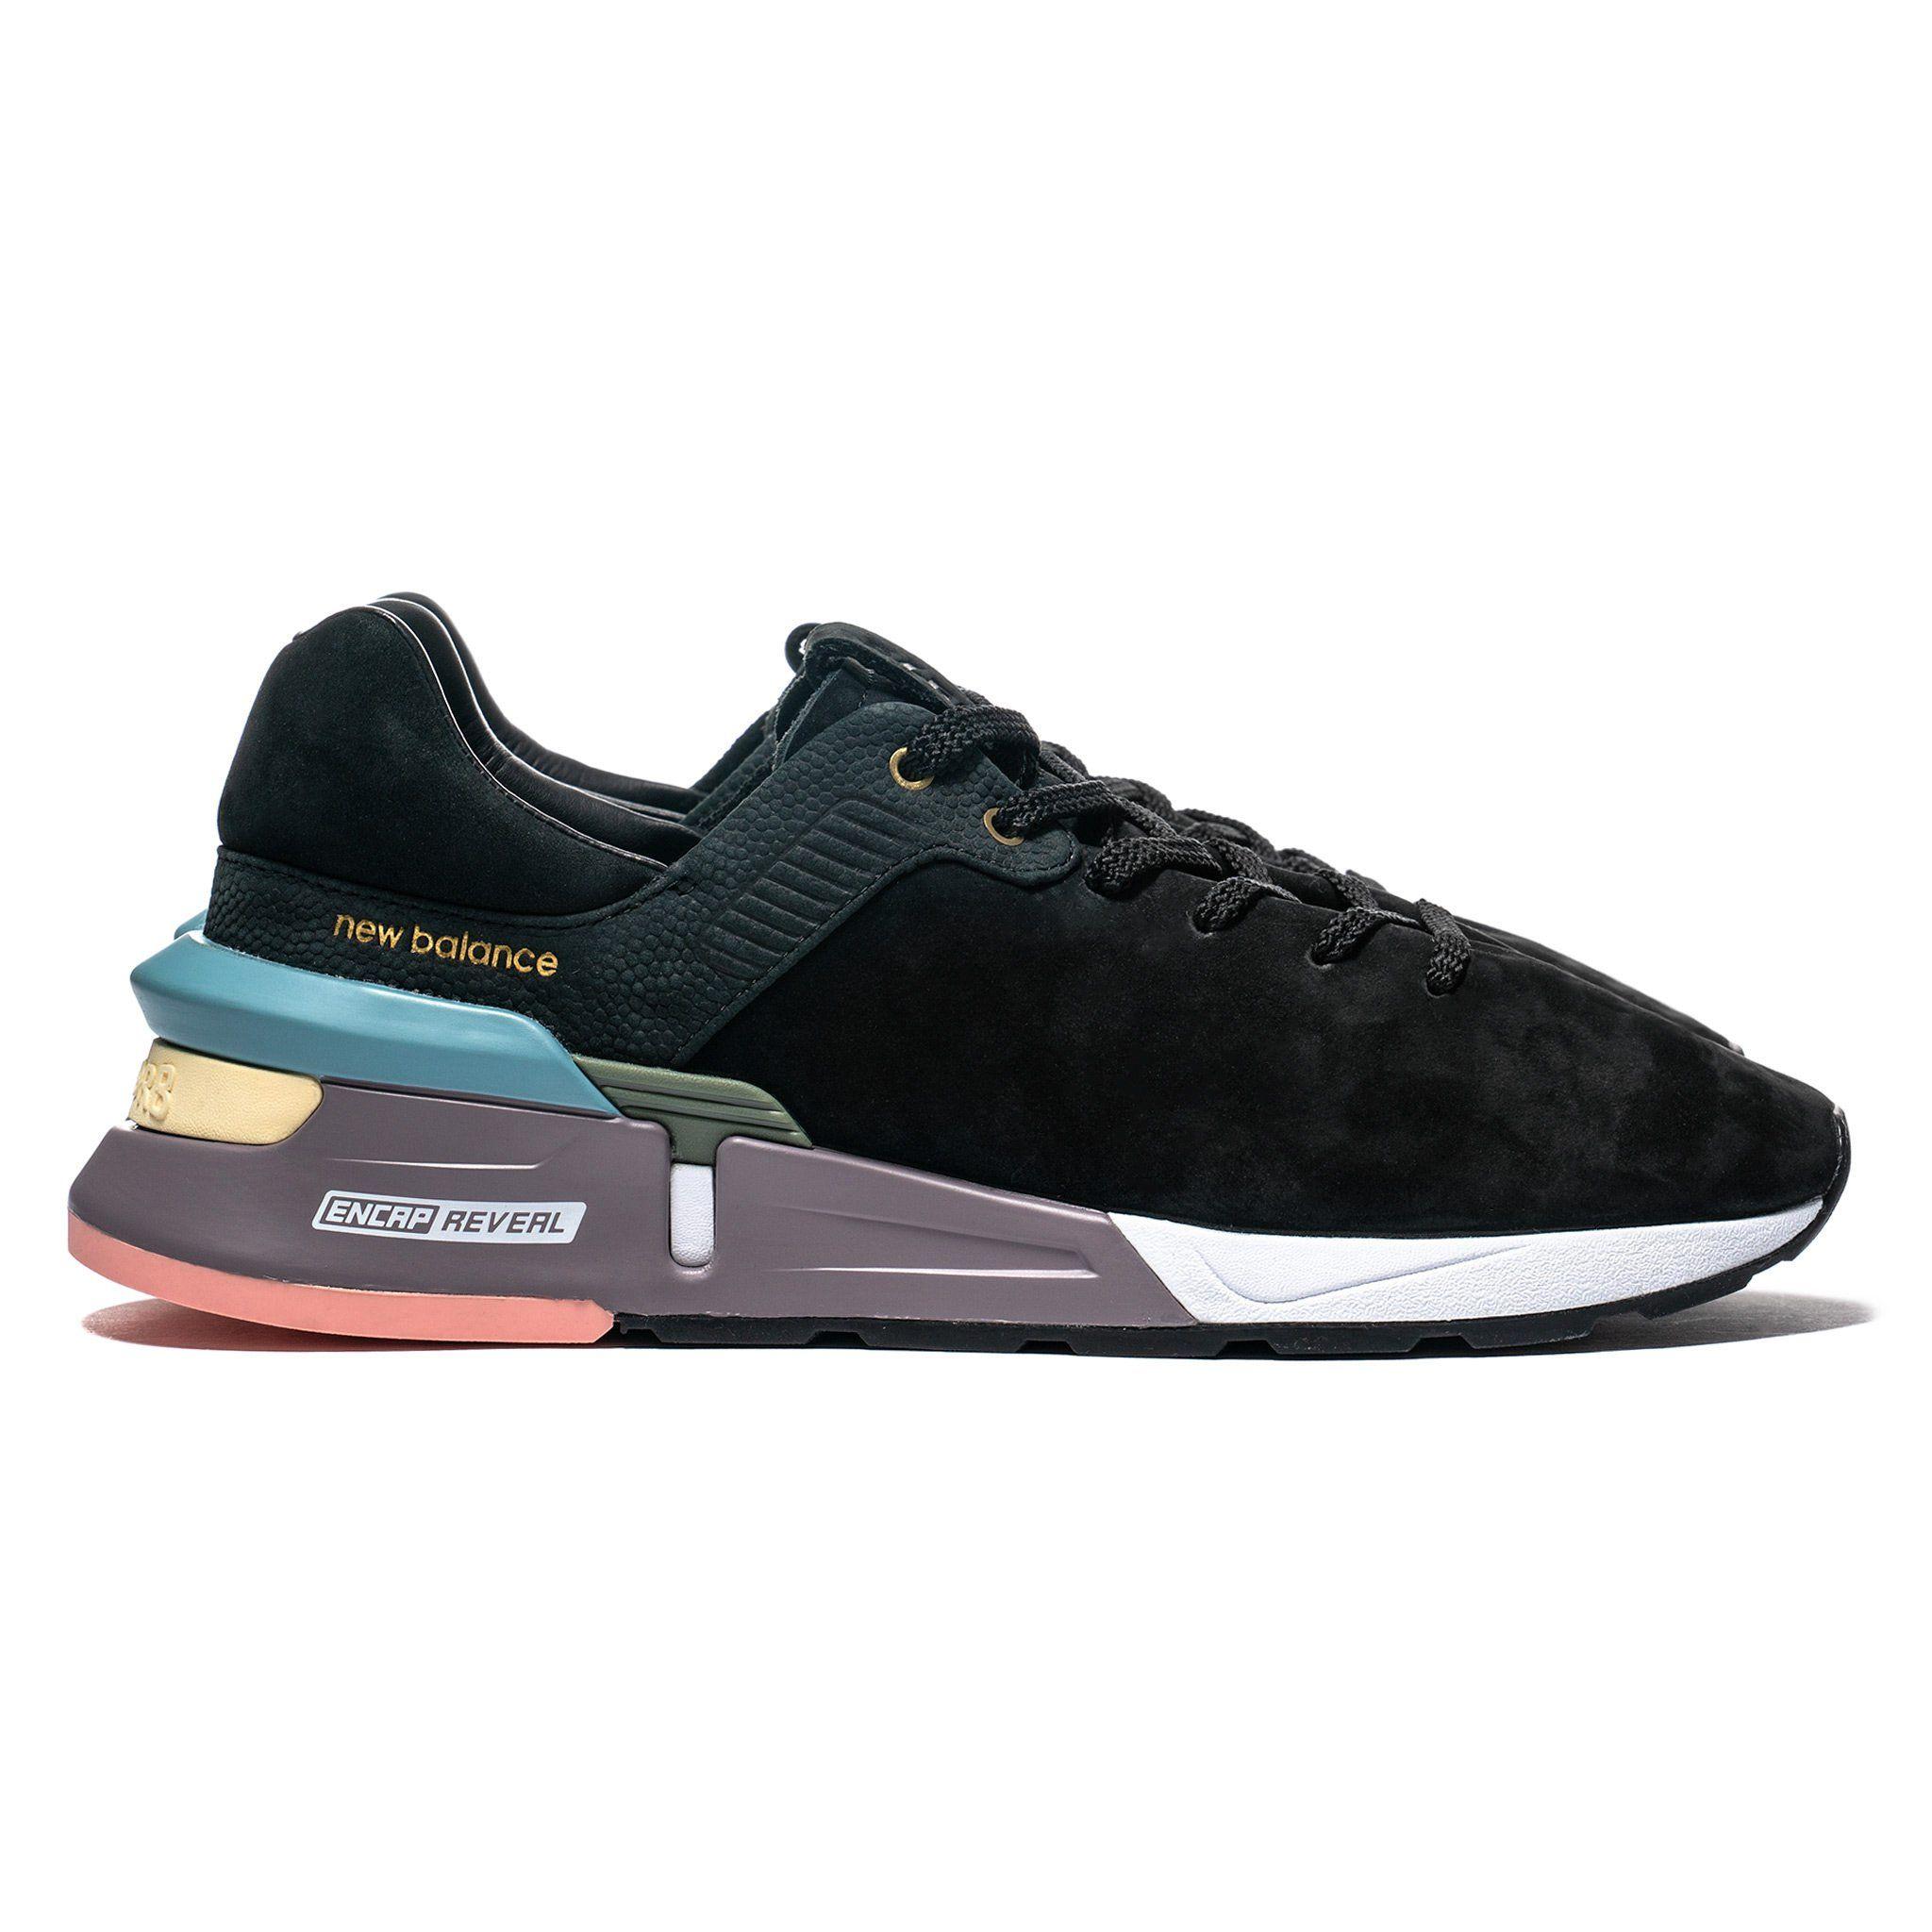 New Balance x Tokyo Design Studio 997 Sport Black